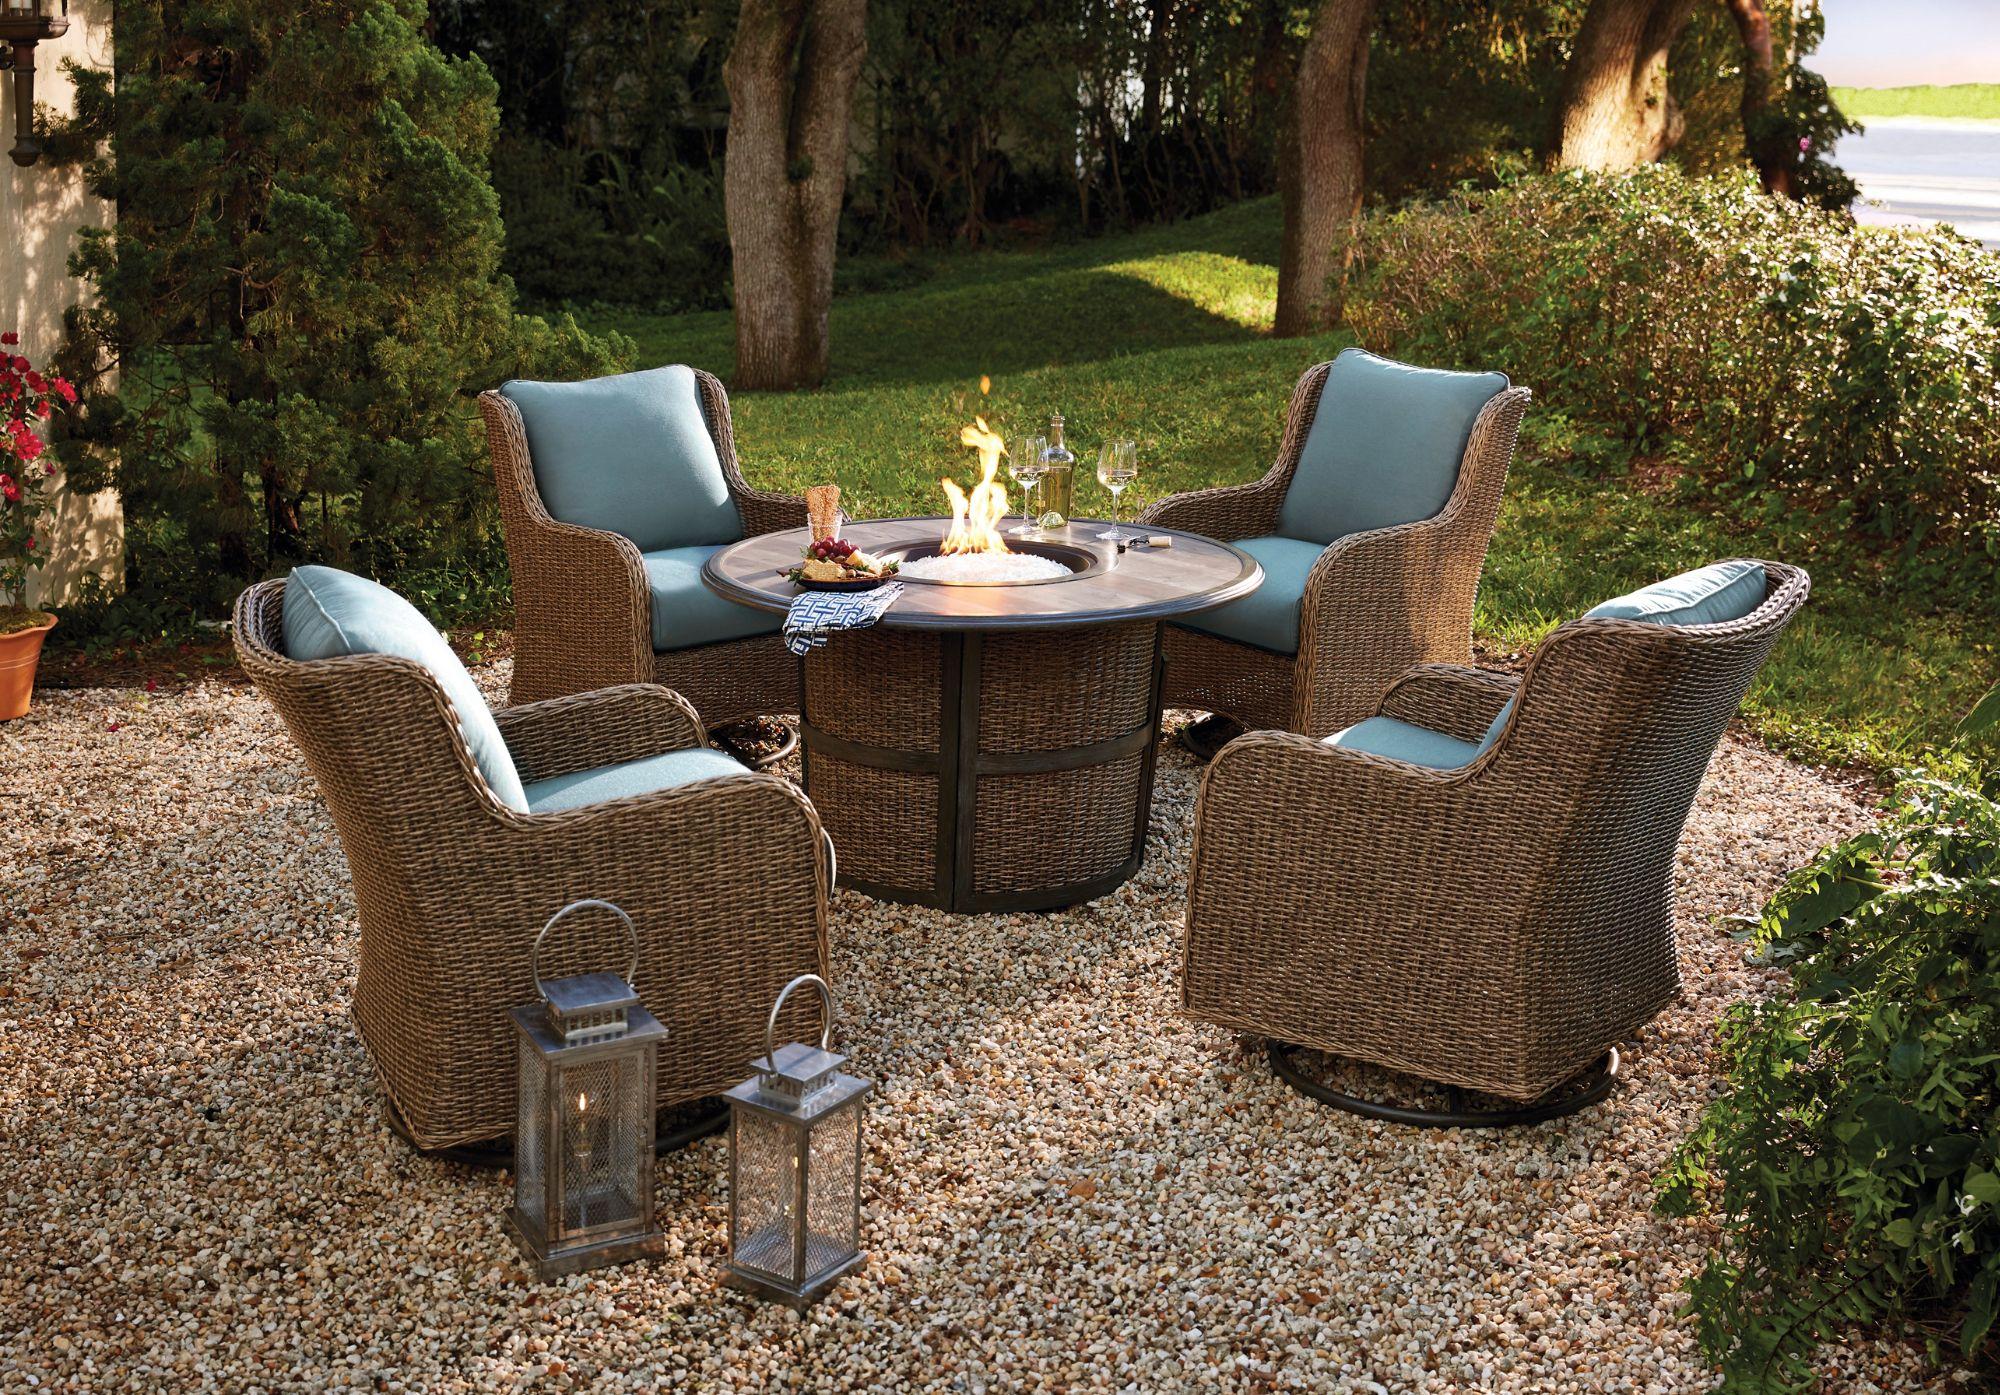 Homestead 5 Pc Firepit Set Backyard Patio Outdoor Furniture Sets Outdoor Living